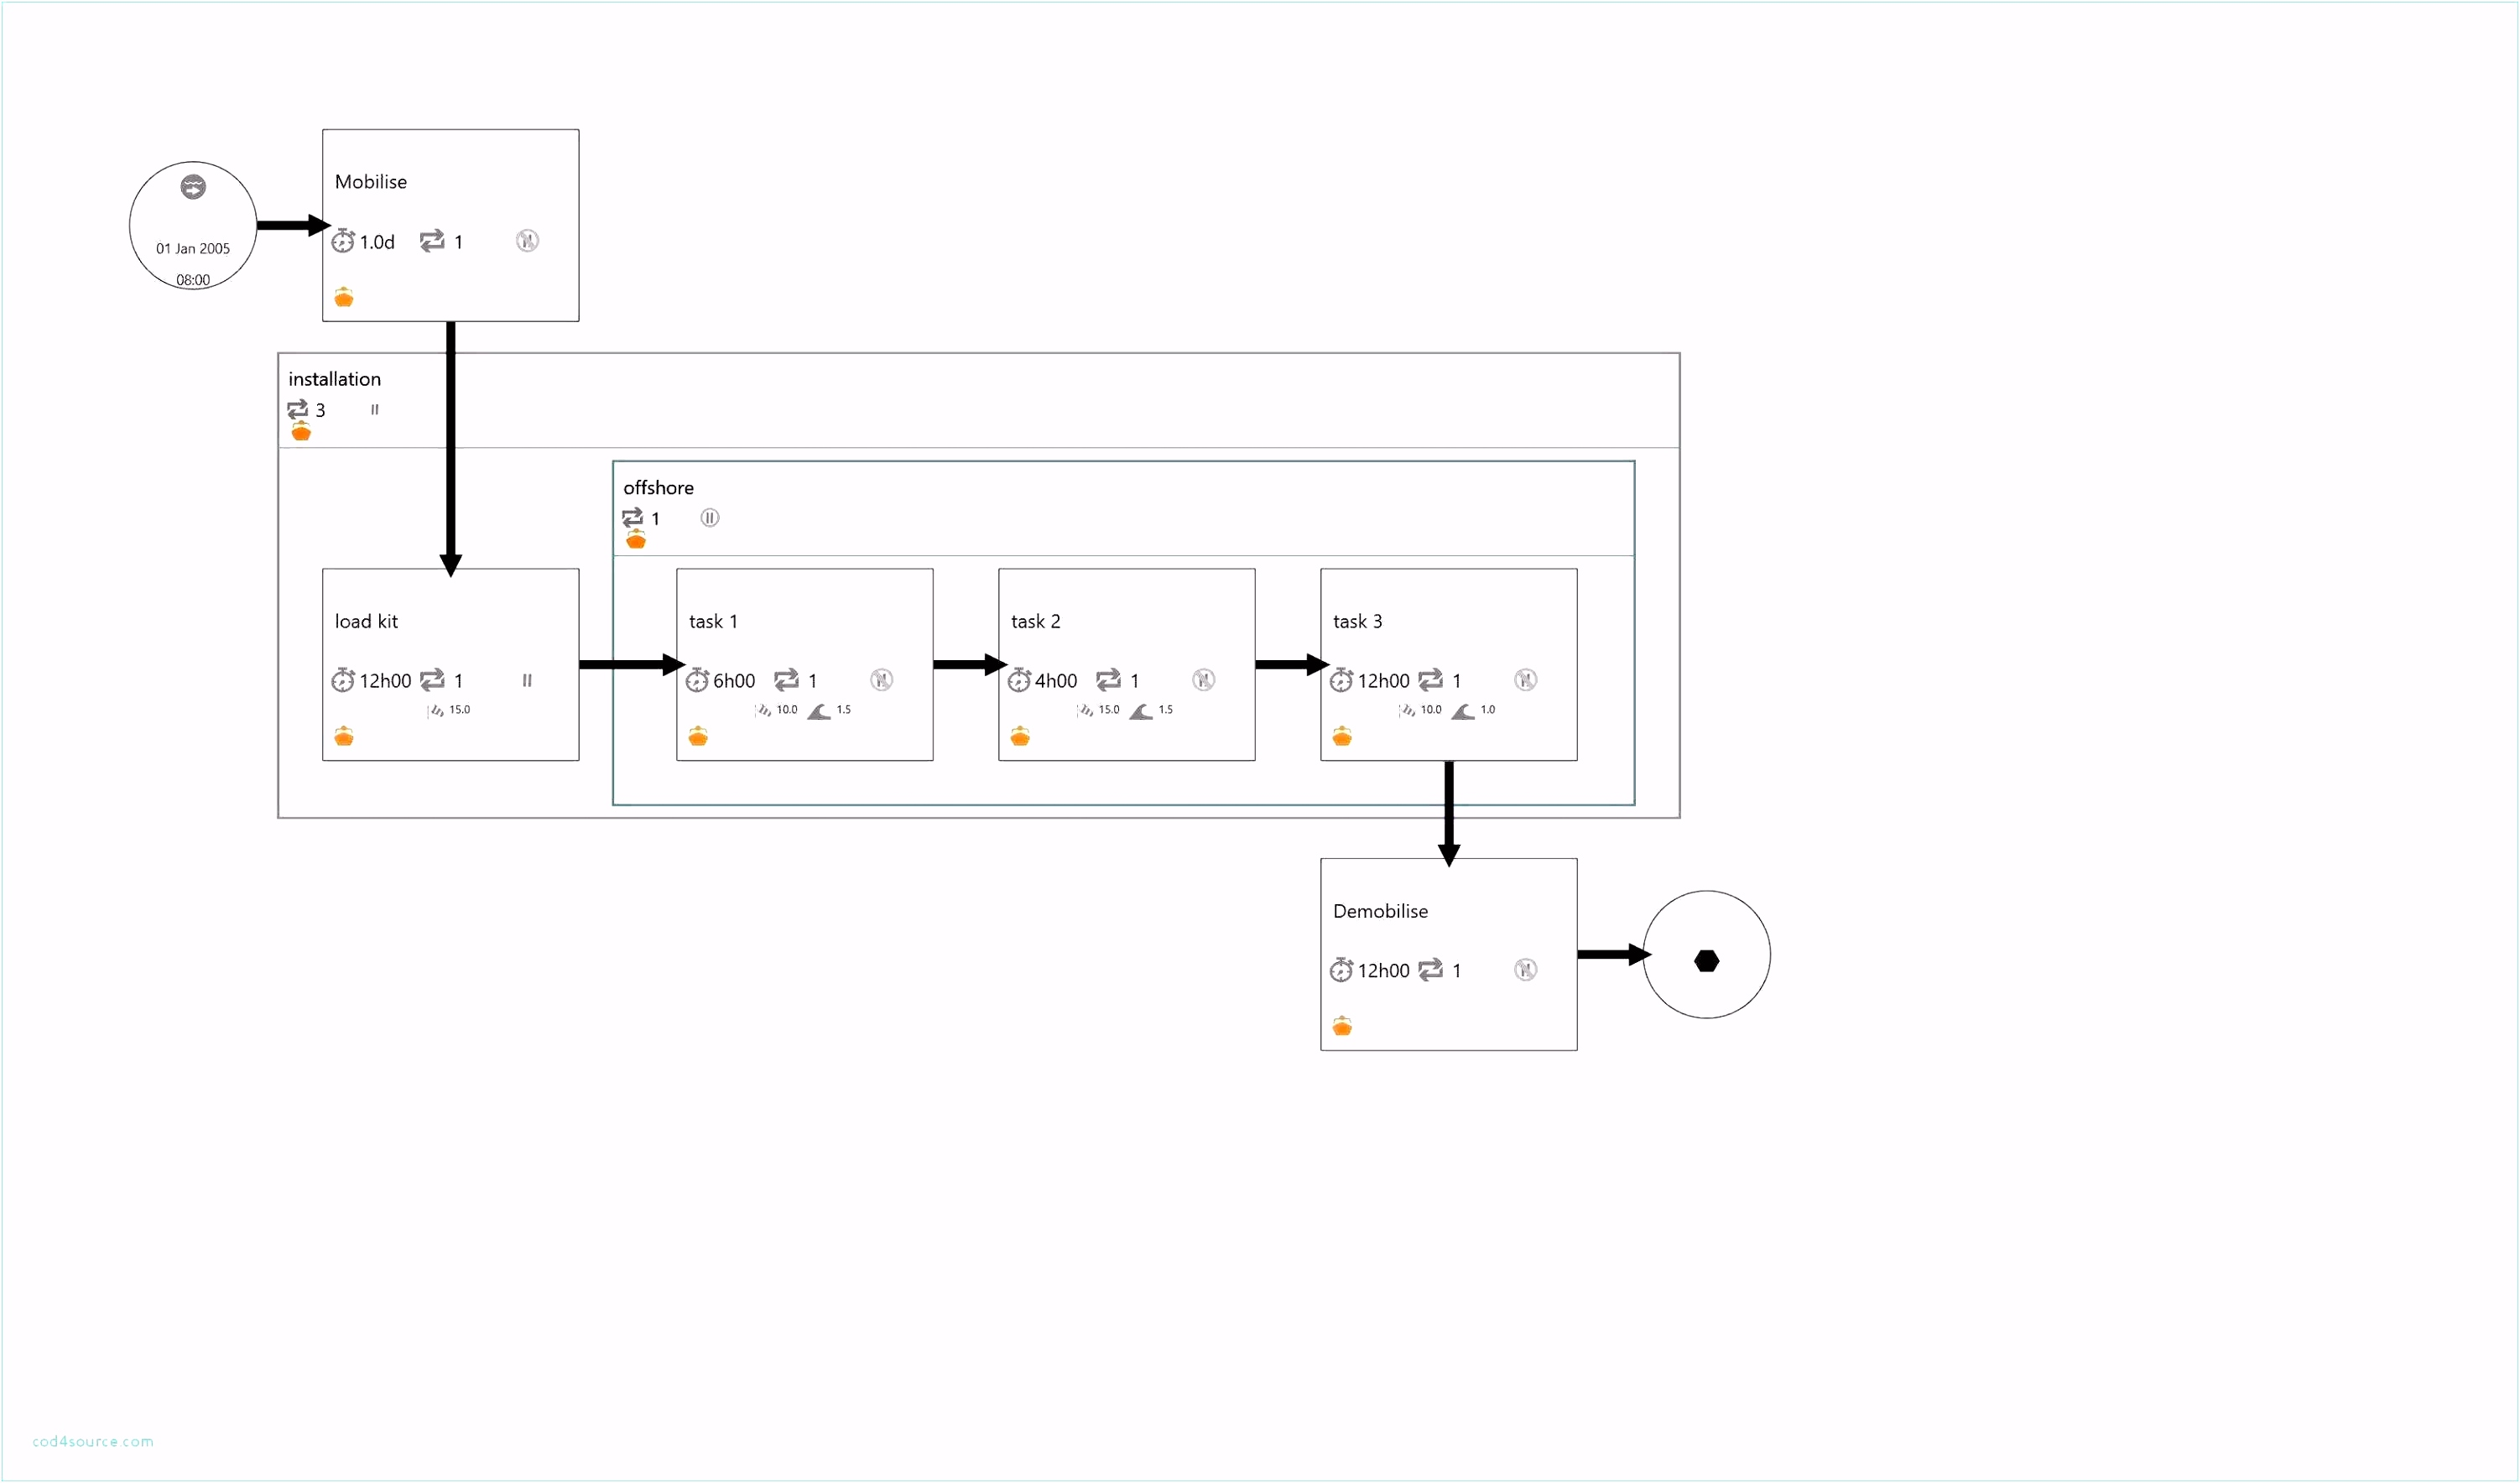 Benefits Gantt Chart Excel Based Gantt Chart then organigramm